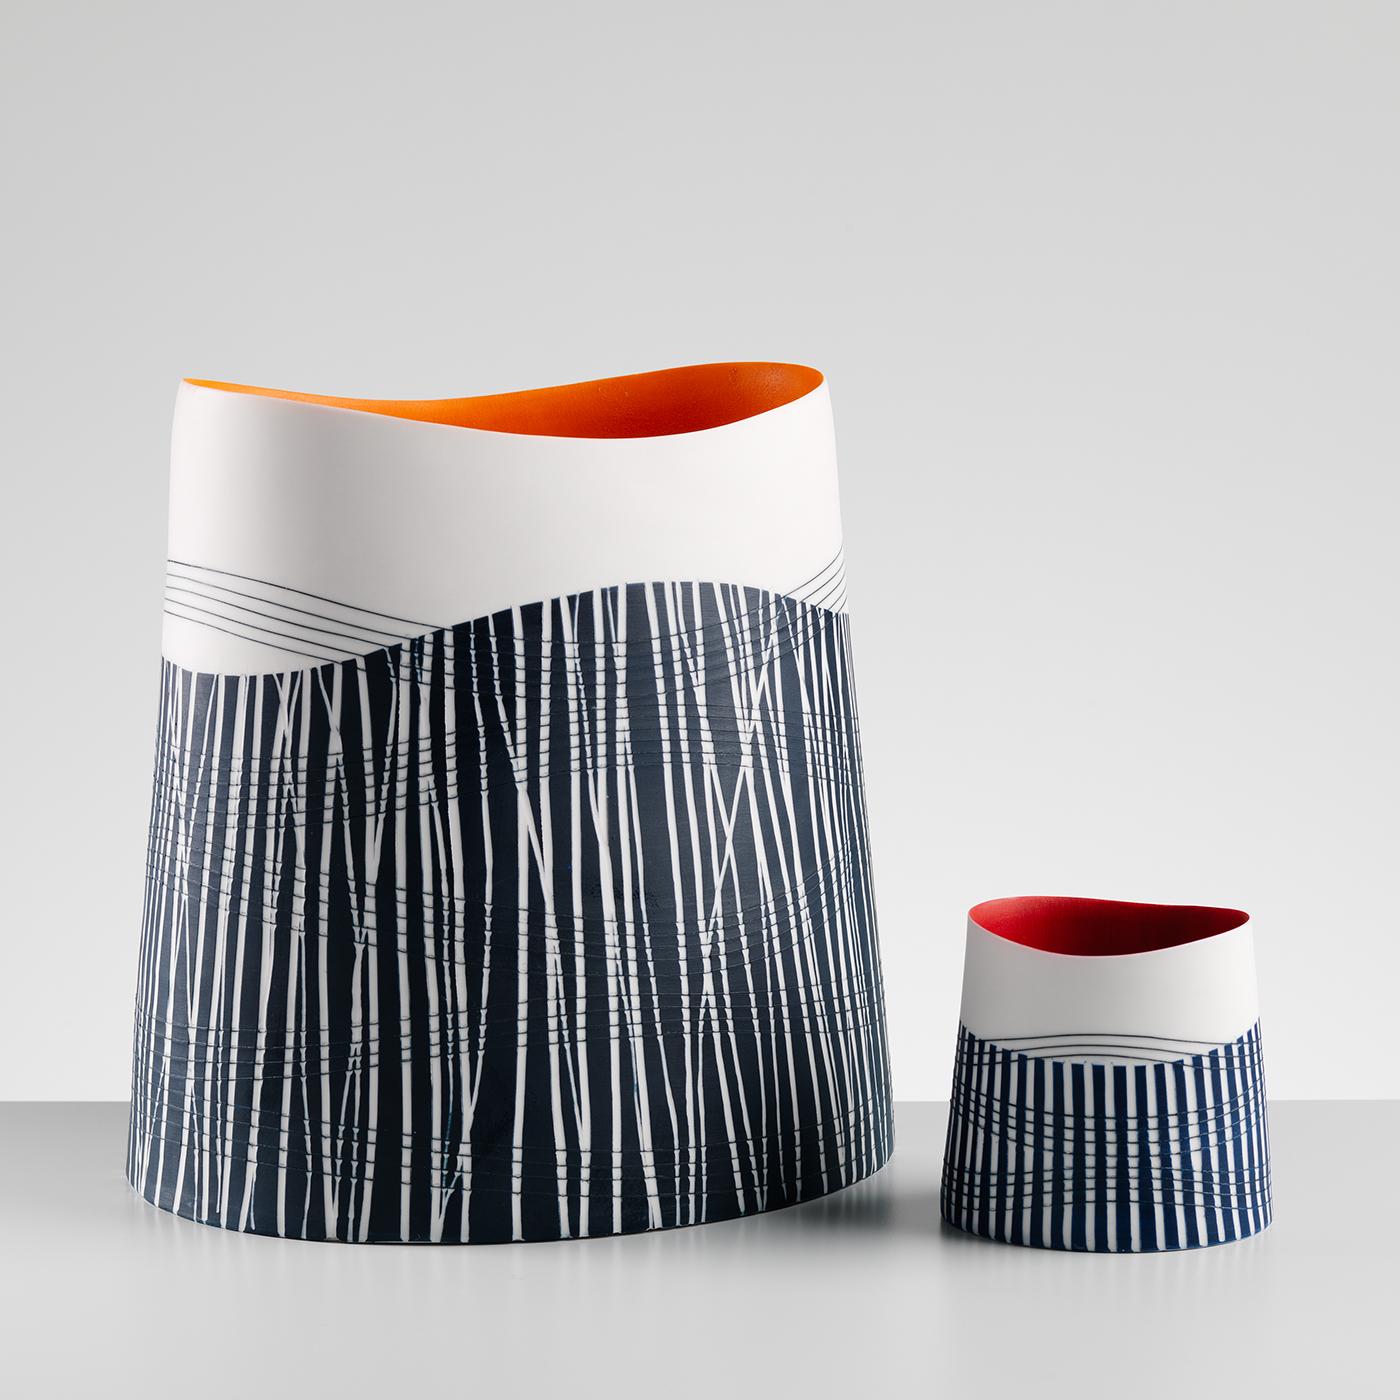 Craft Scotland What's On listing | The Scottish Gallery, Lara Scobie Solo Exhibition of Ceramics